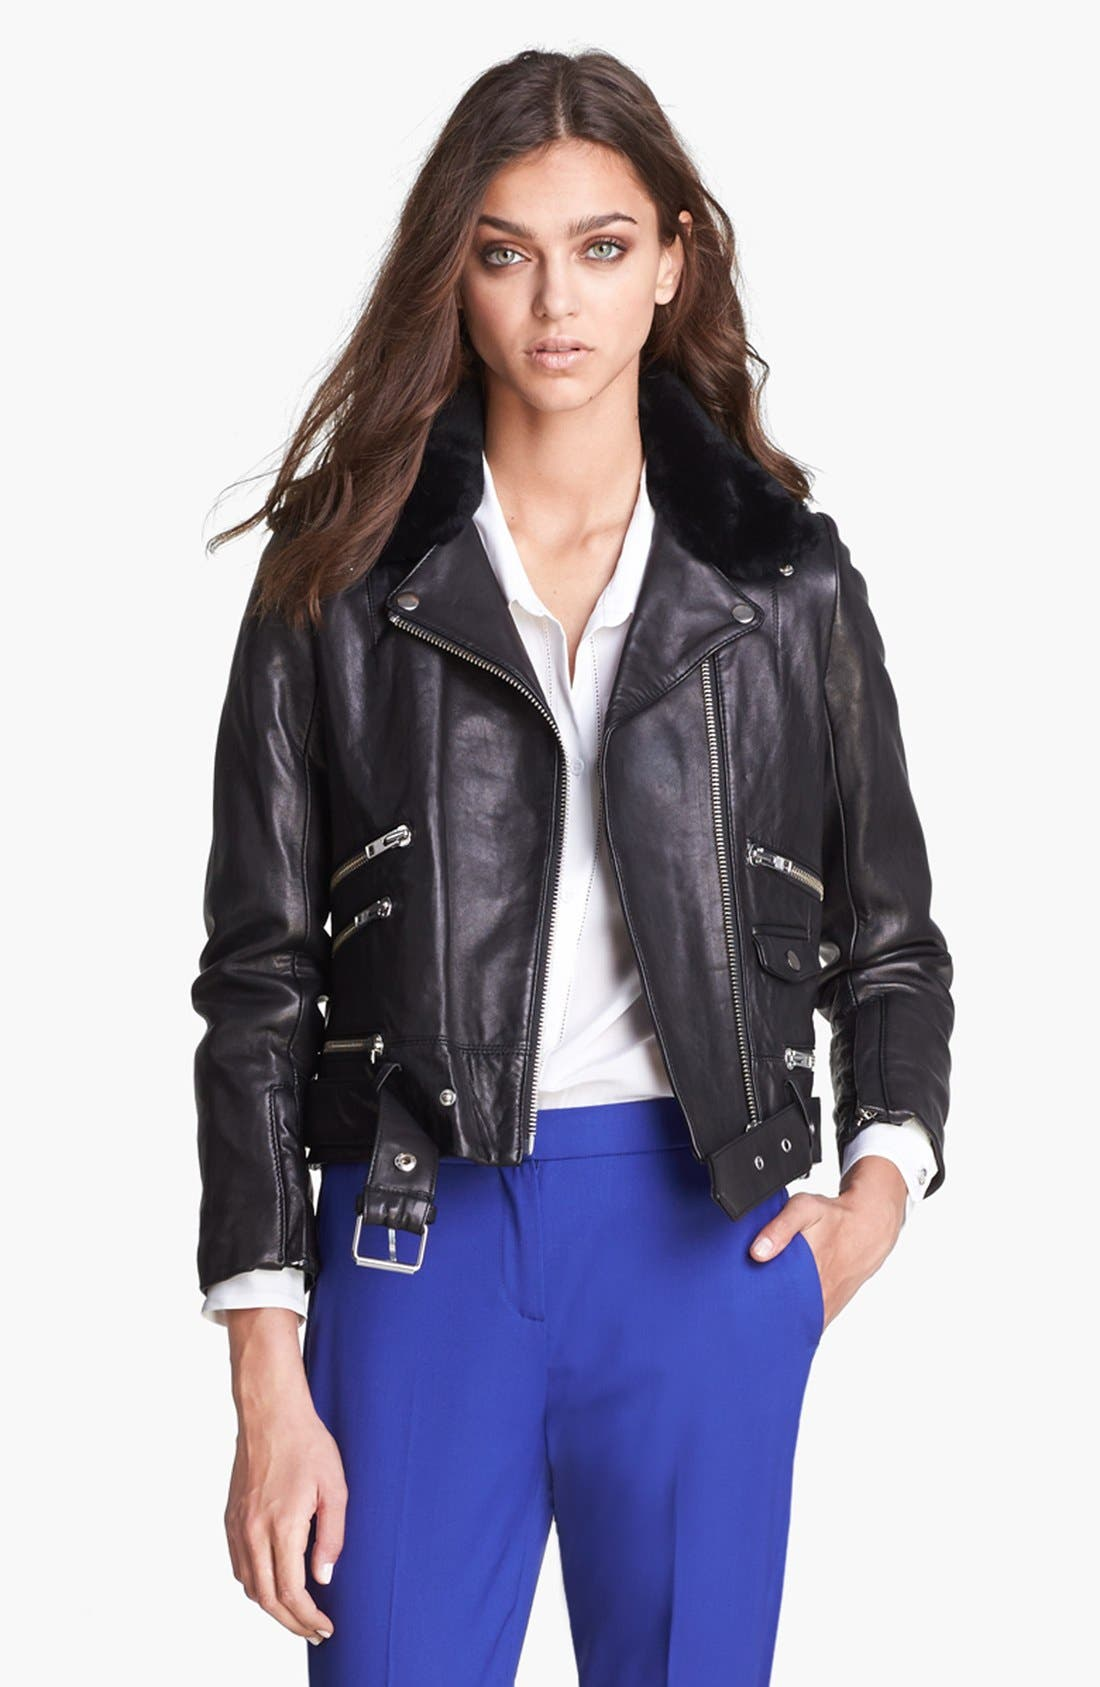 Main Image - The Kooples Leather Biker Jacket with Genuine Fur Collar